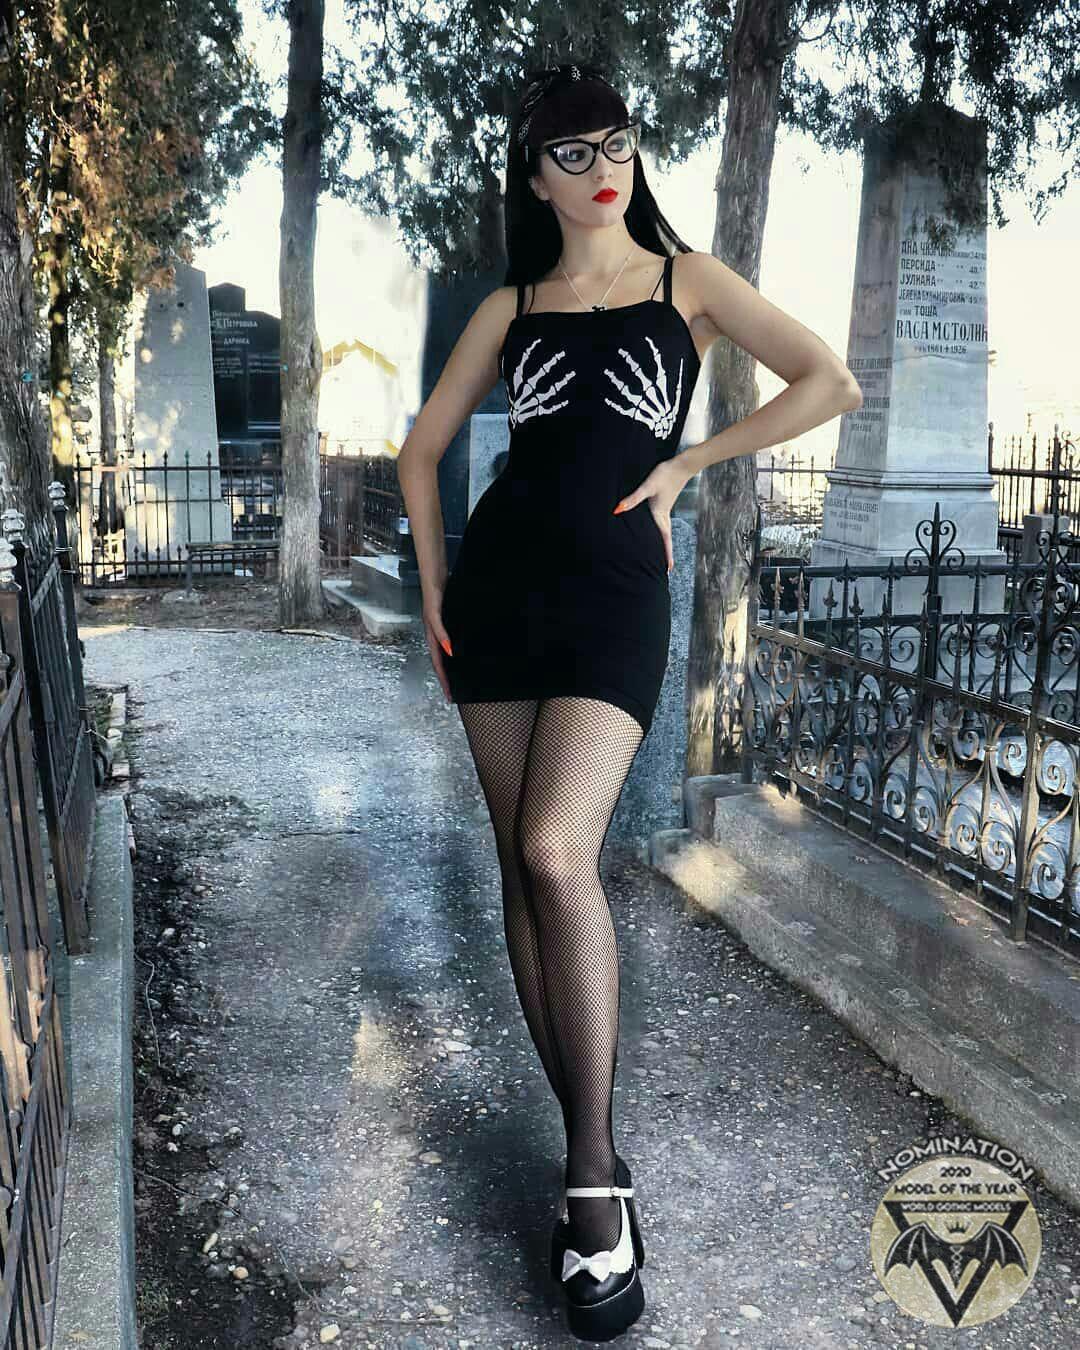 23. @emilia_wilde, Serbia